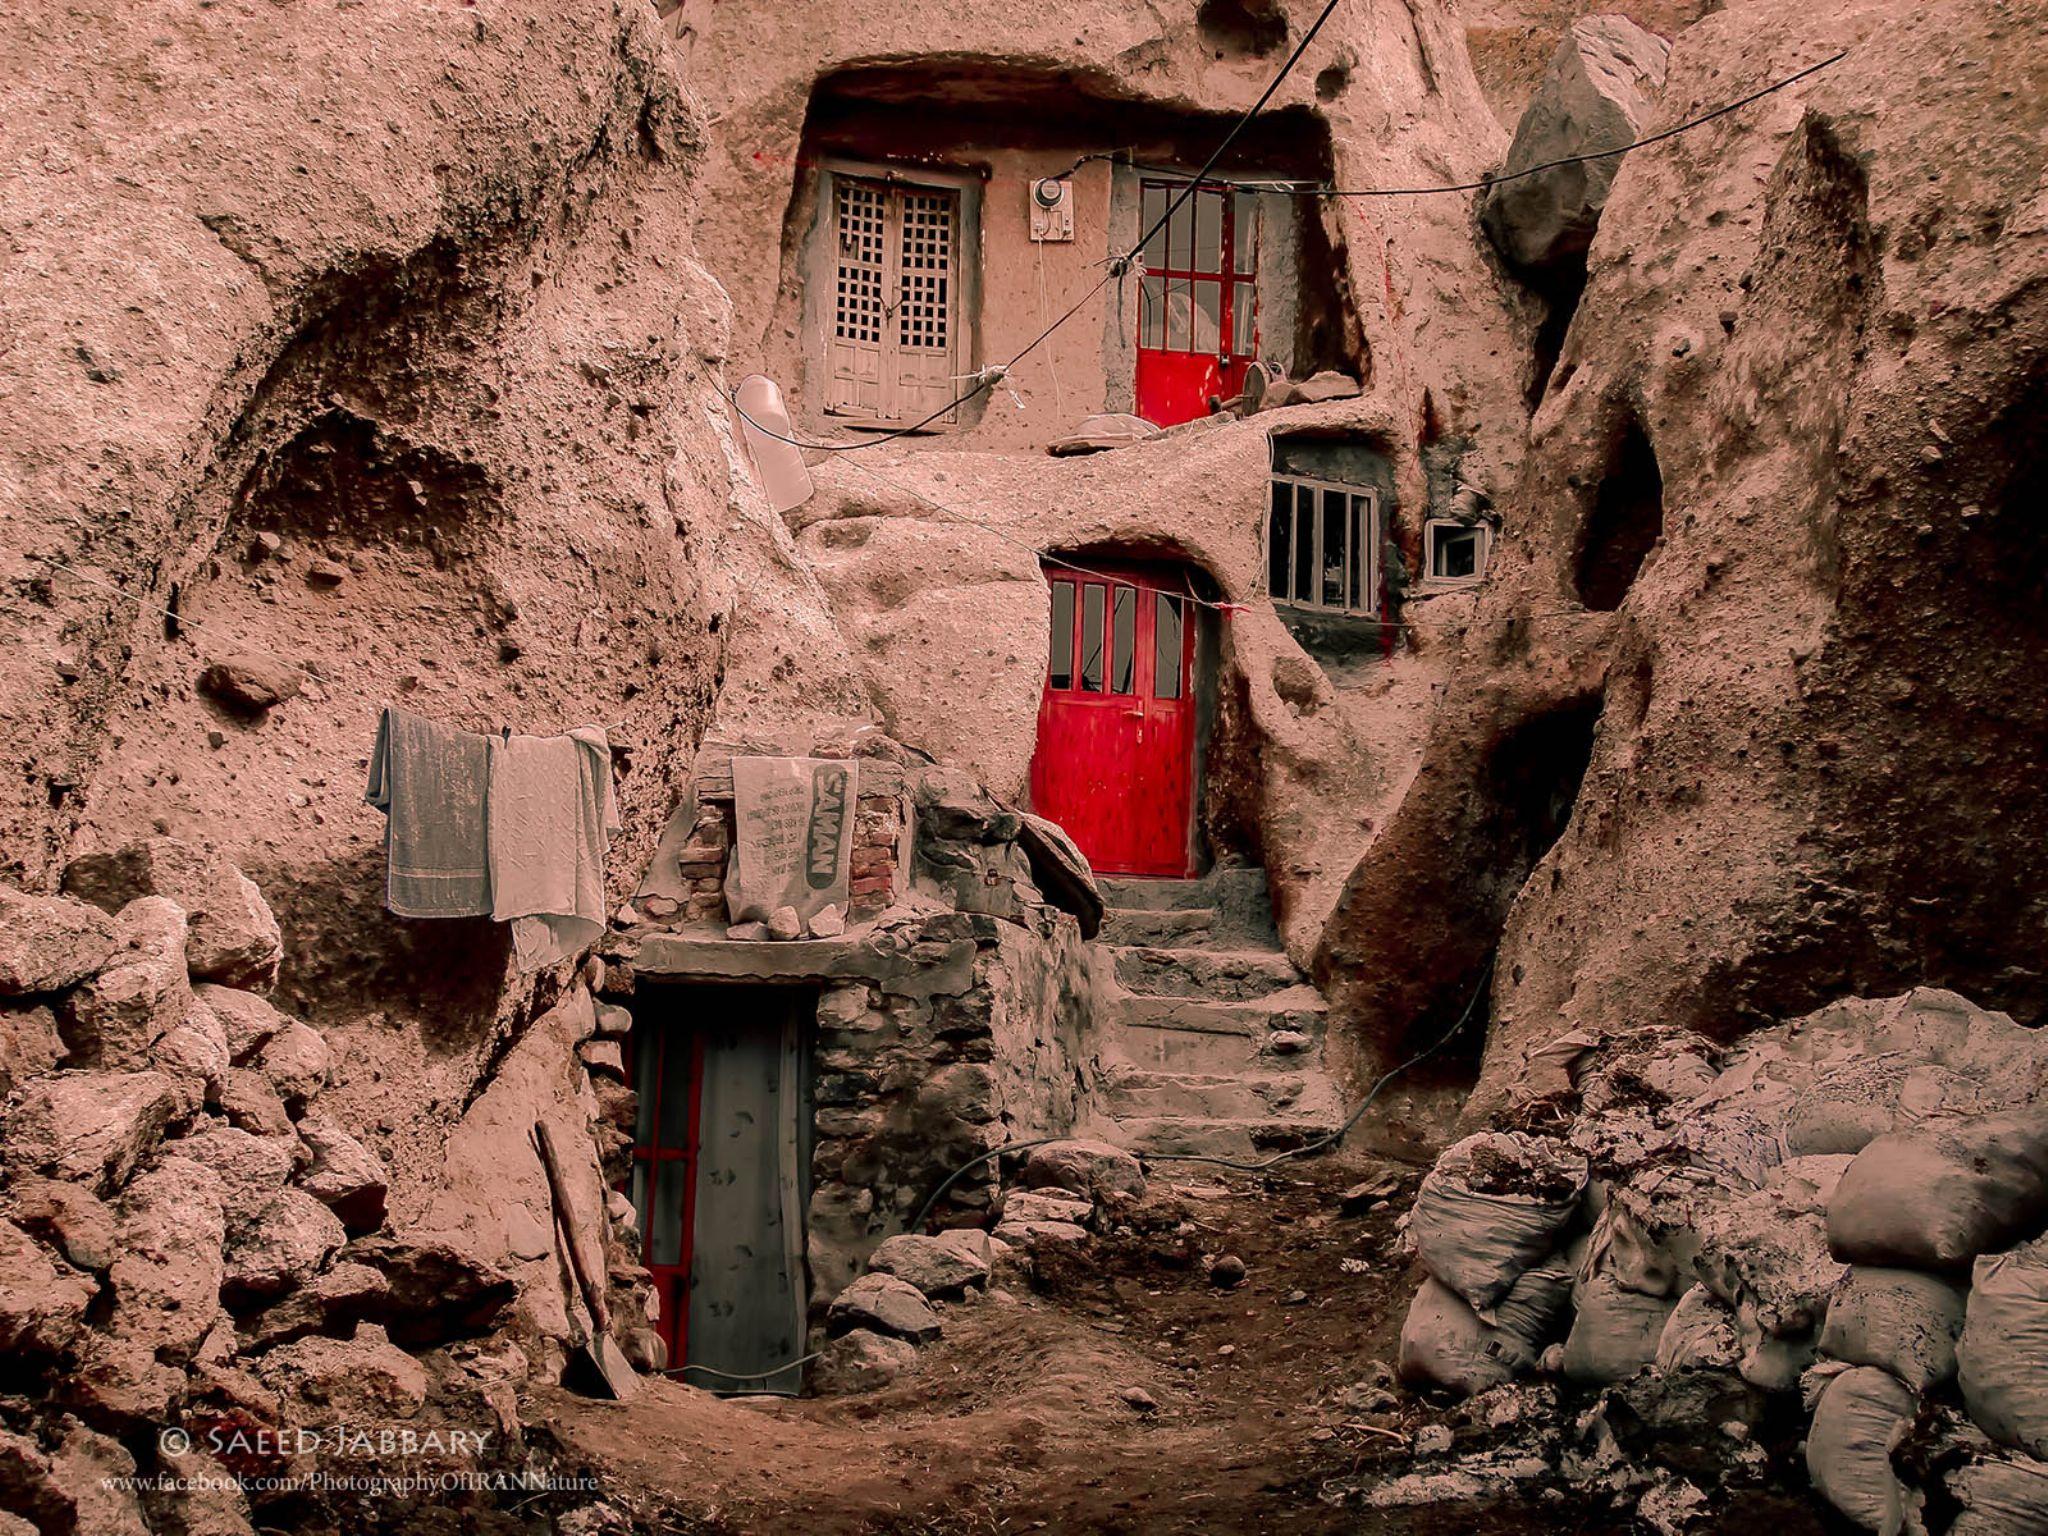 Red doors-Iran-kandovan by Saeed Jabbari